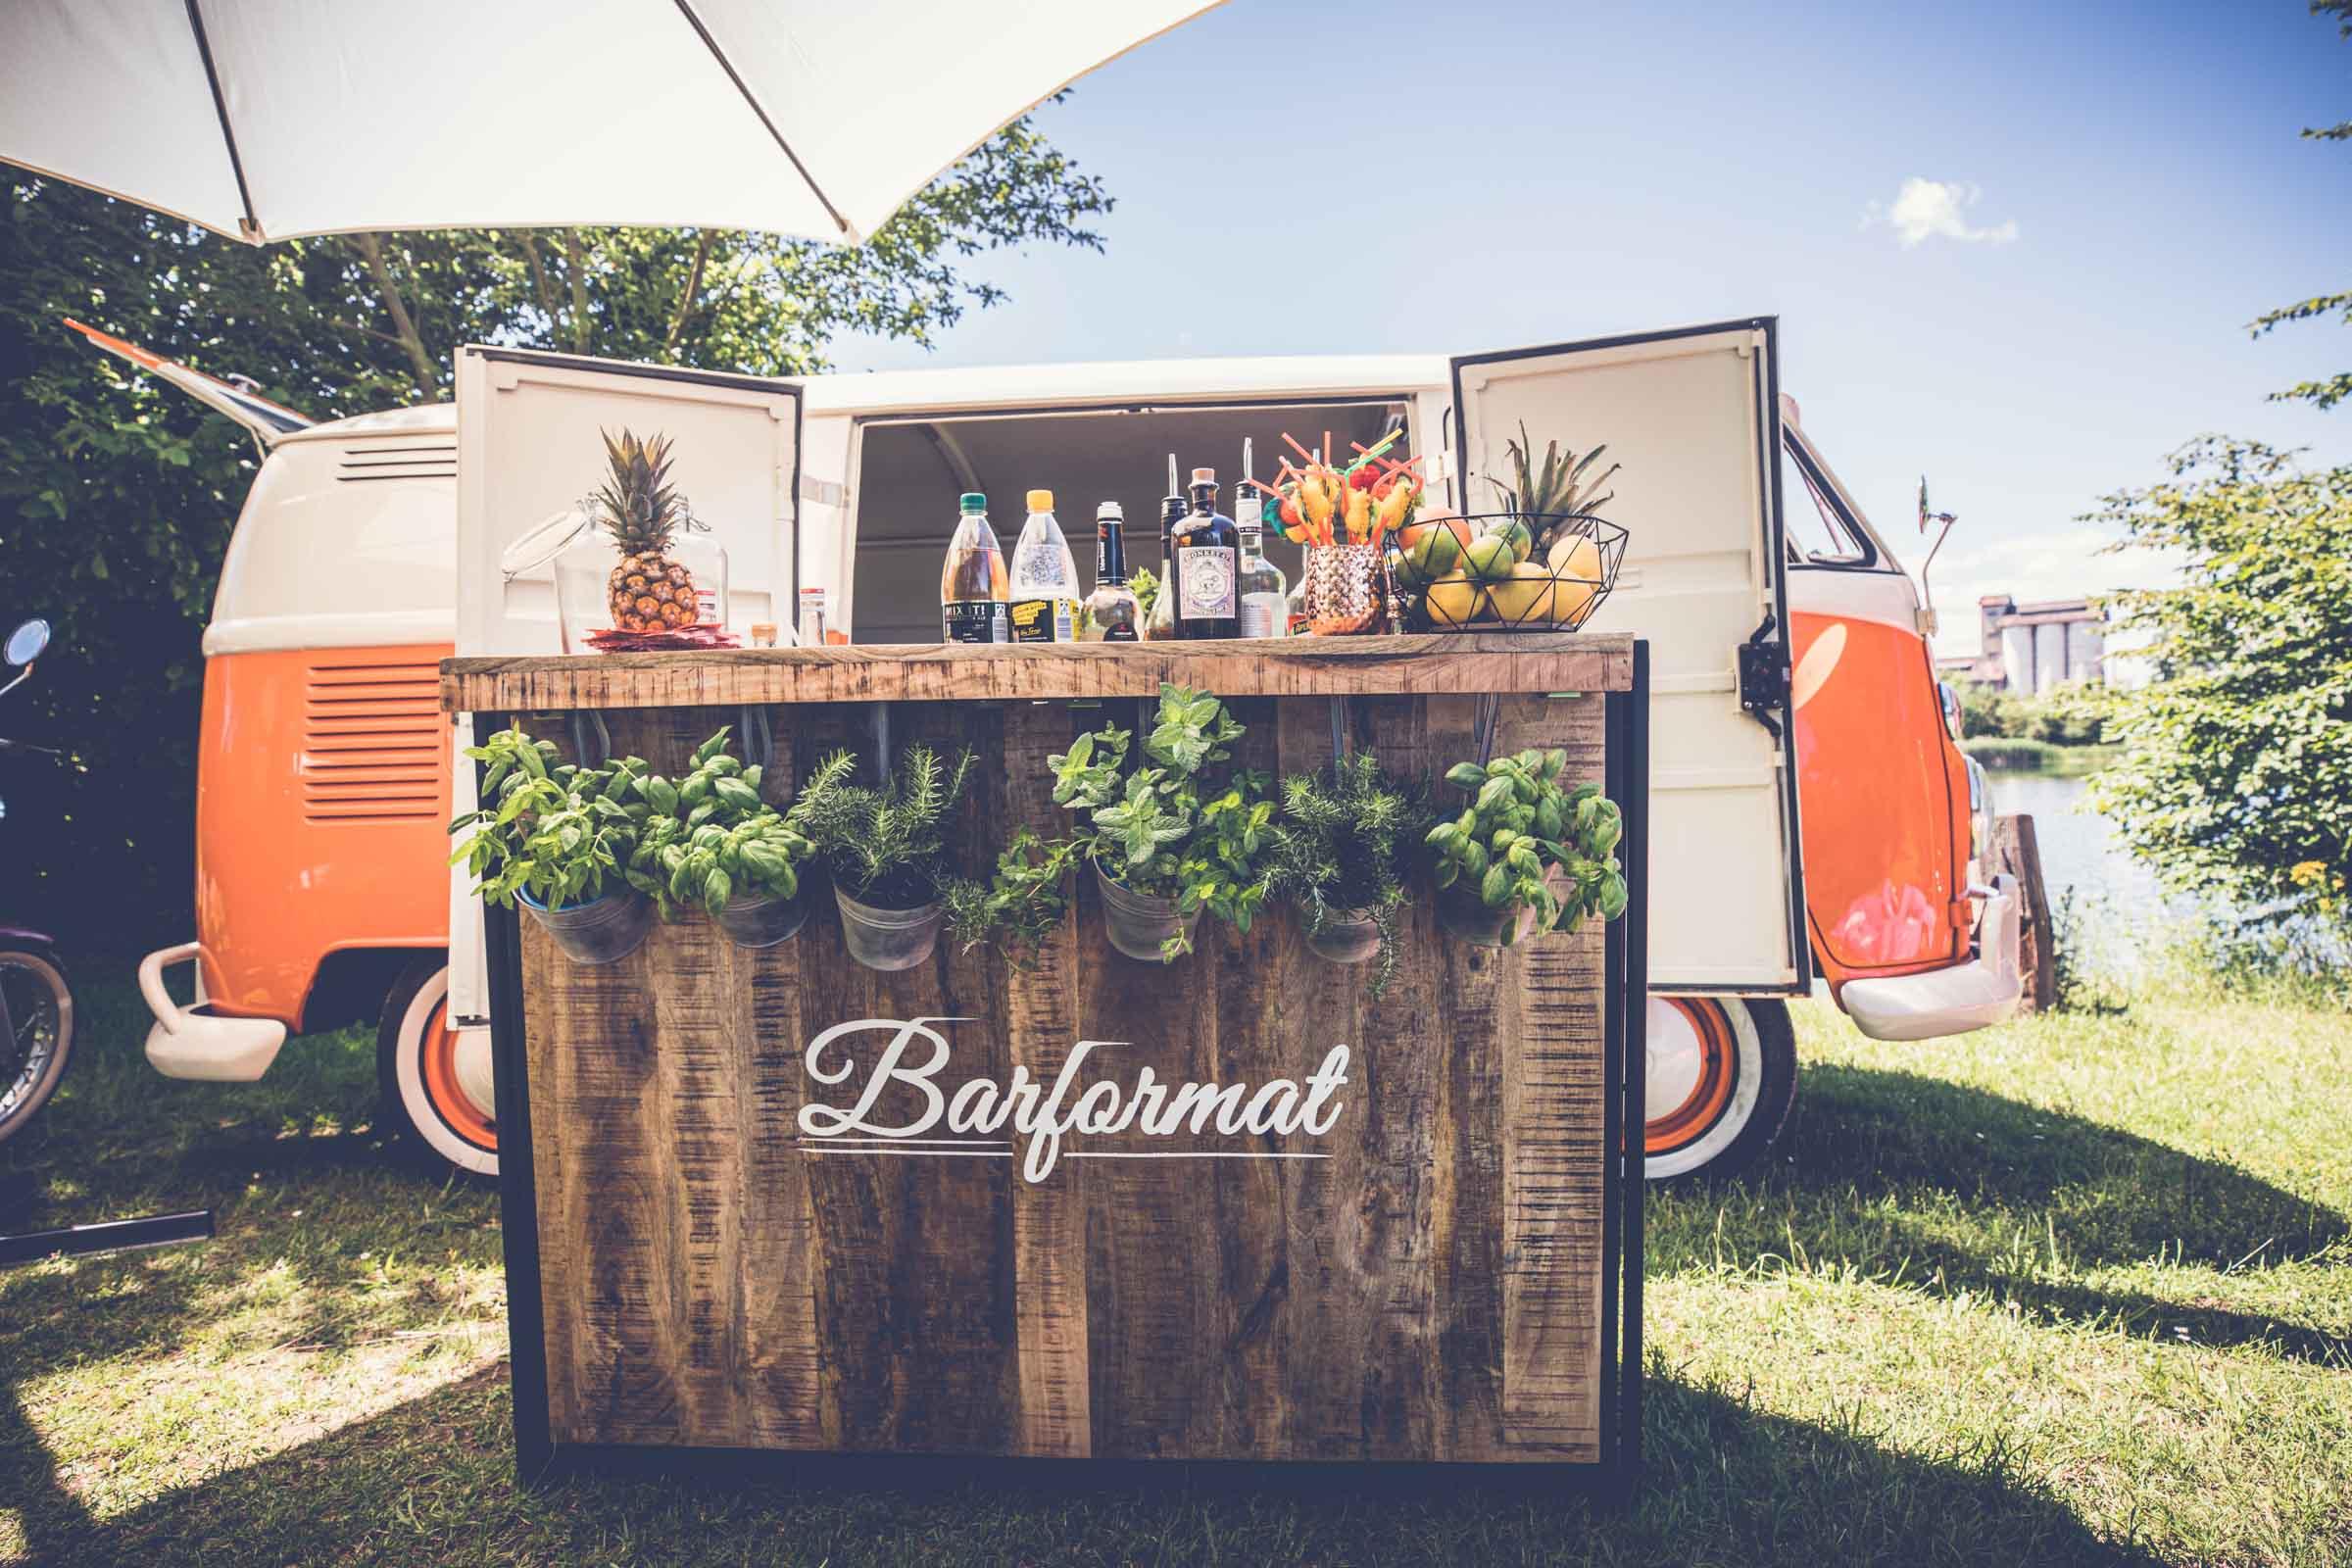 Mobile | Bar | Cocktailservice | Hannover | Cocktailbar | Getränke | Catering | Cocktails | Wein | Aperitif | Gin | Kaffee | Softdrinks | Foodtruck | Hochzeit | Messe | Firmenfeier | Buchen | Mieten | Anfragen